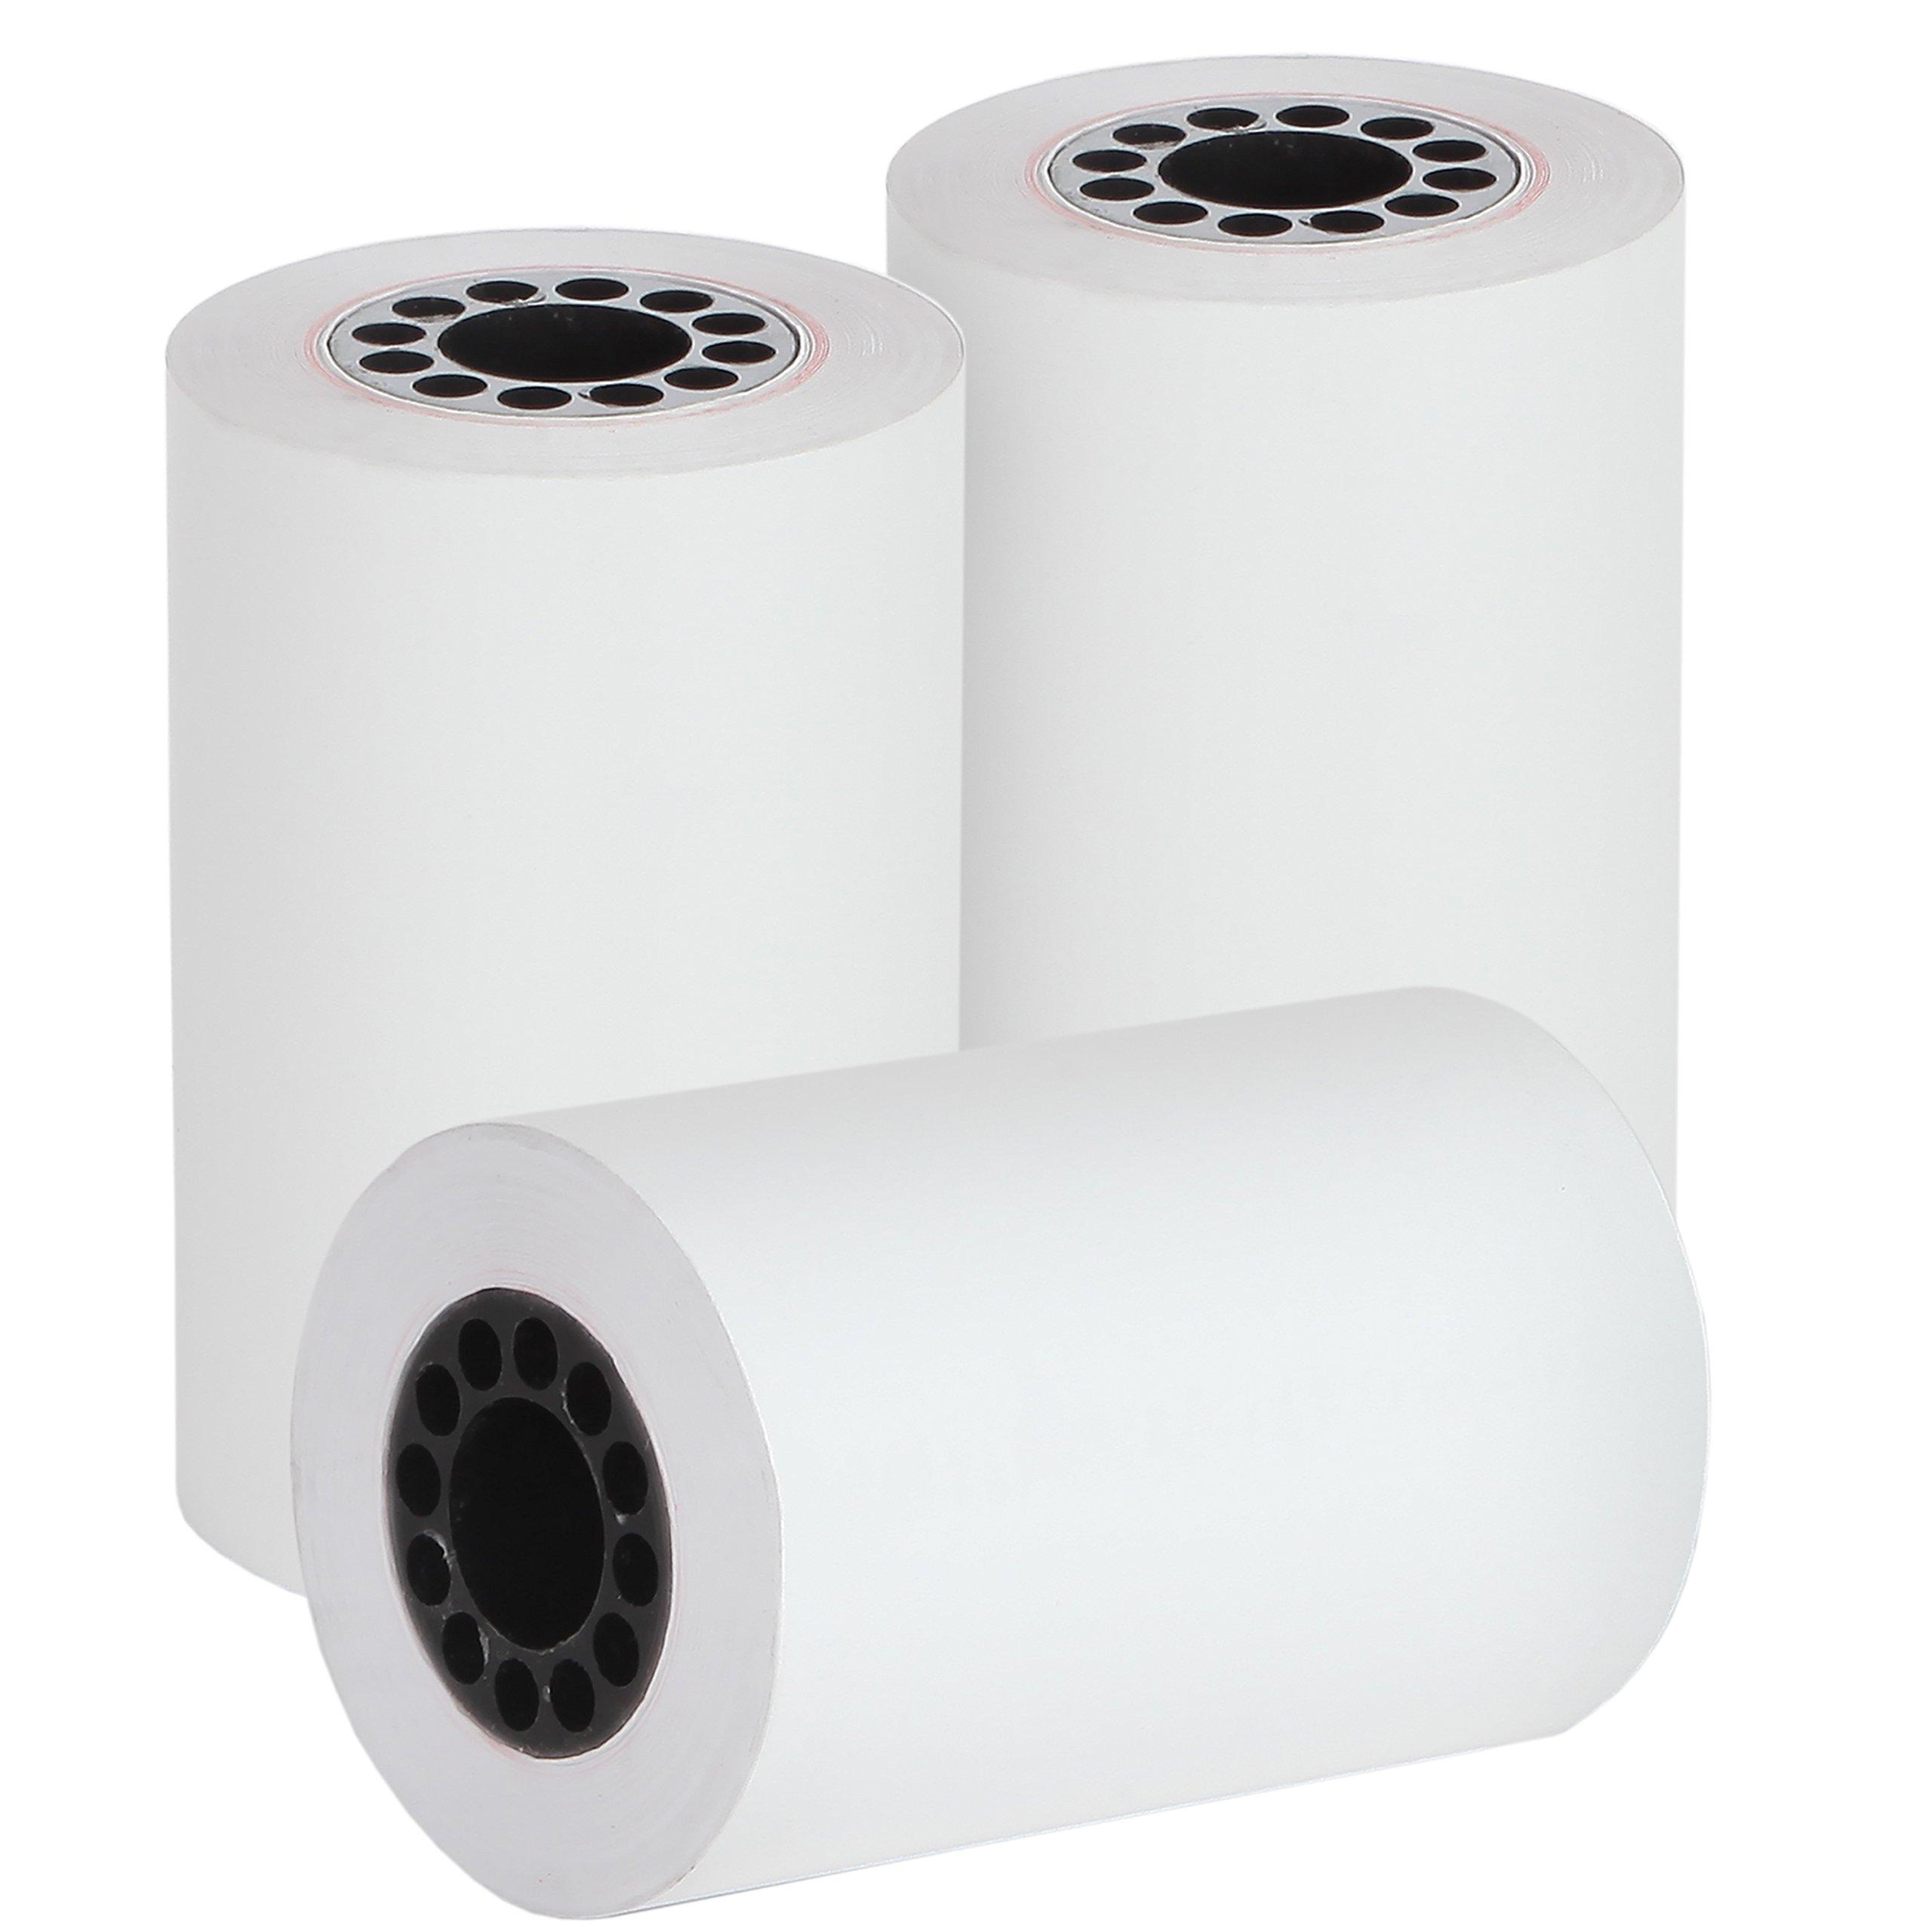 Freccia Rossa Market, (50 Rolls) 2 1/4'' X 50' Thermal Receipt Printer Paper for Verifone VX520, First Data FD400, Nurit 8000 by Freccia Rossa Market